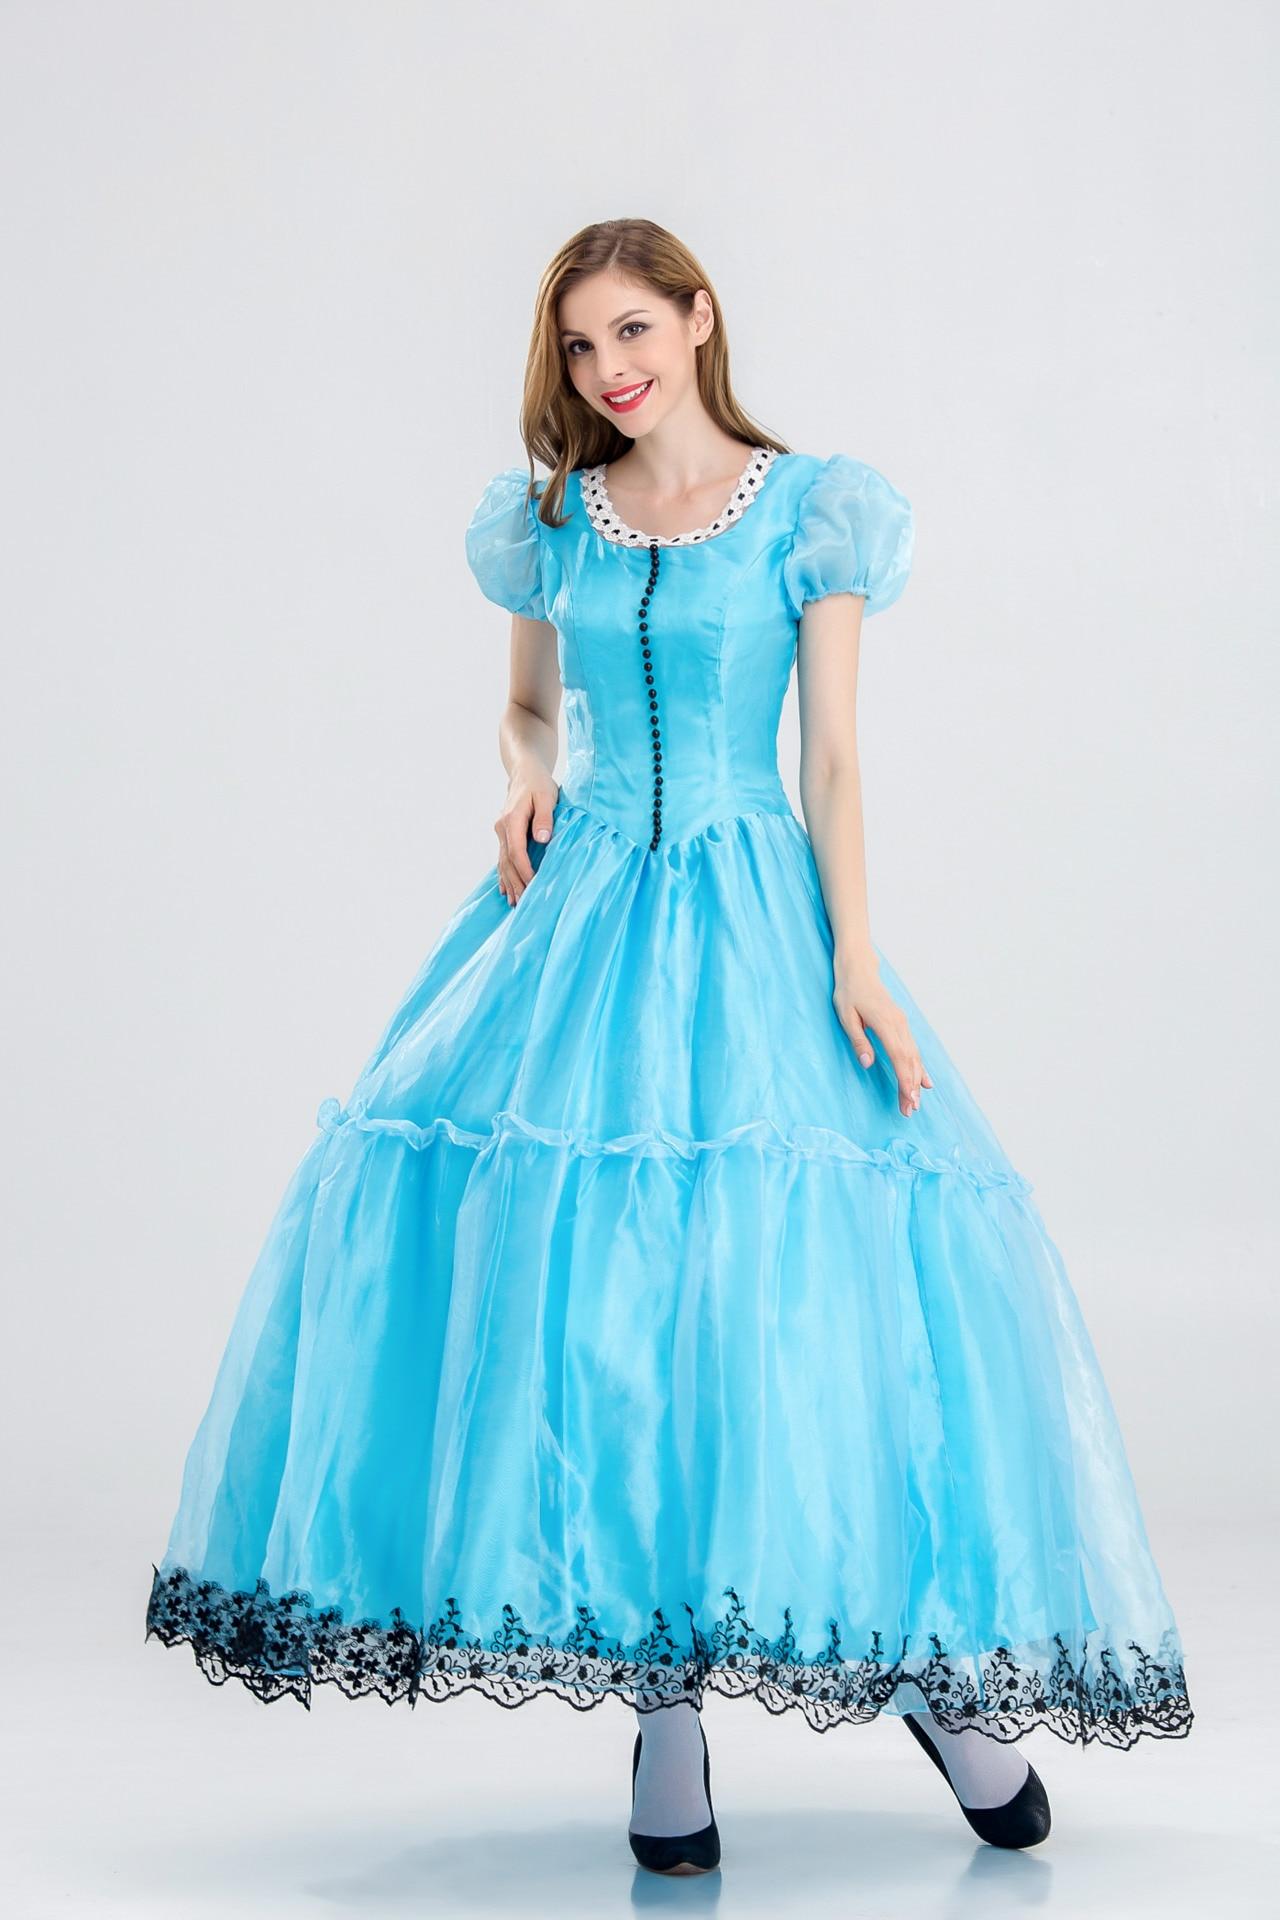 Unique Dresses For Halloween Party Festooning - All Wedding Dresses ...